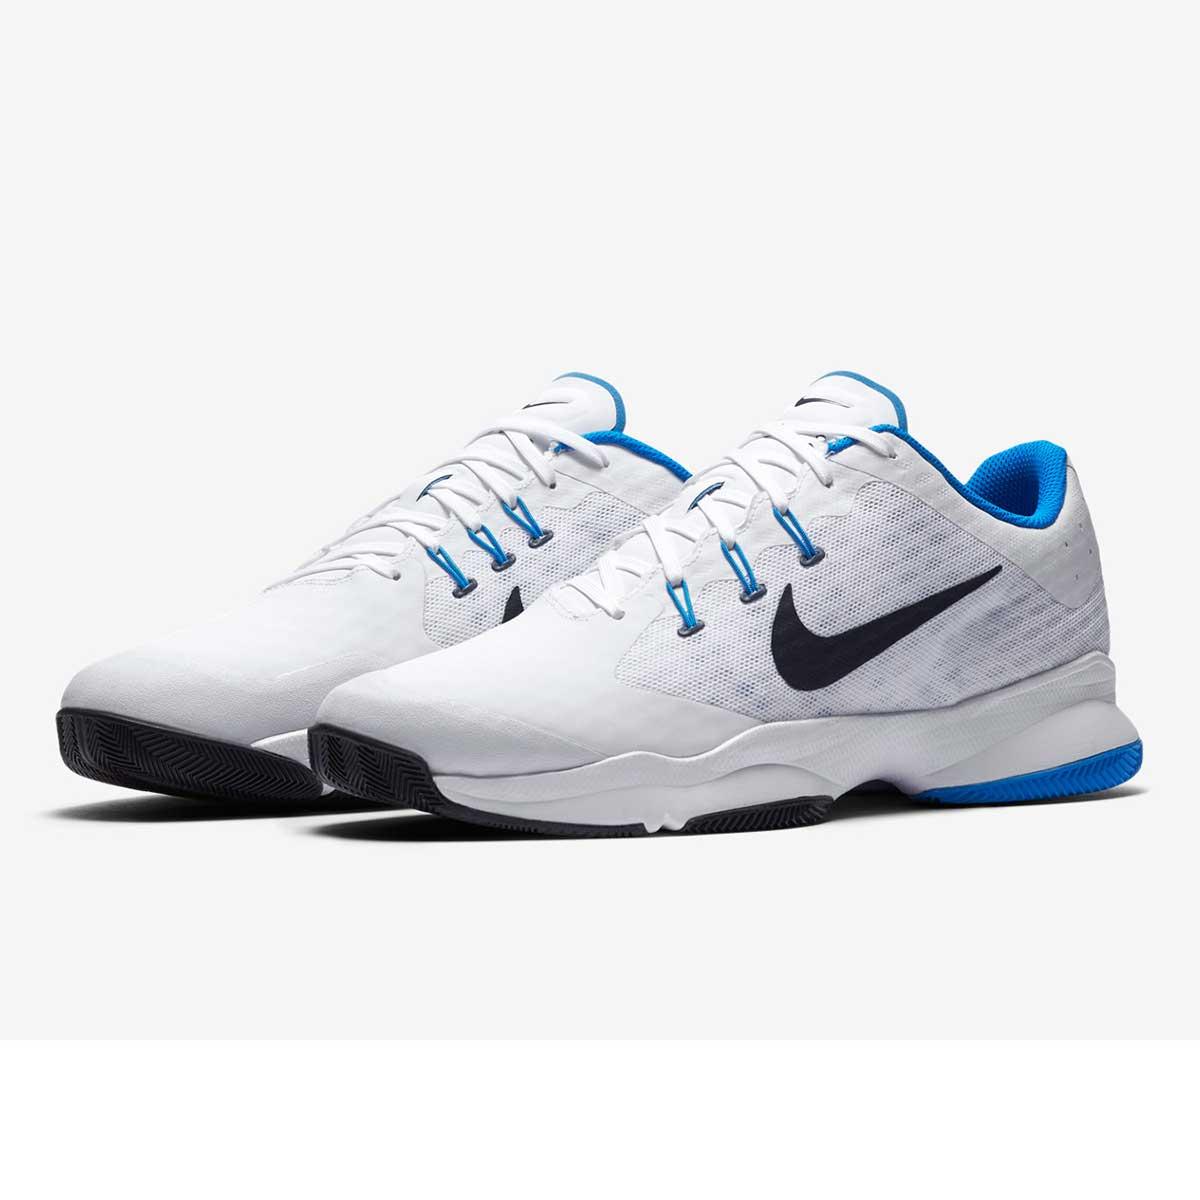 Nike Air Zoom Ultra Tennis Shoes (WhiteBlueObsidian)